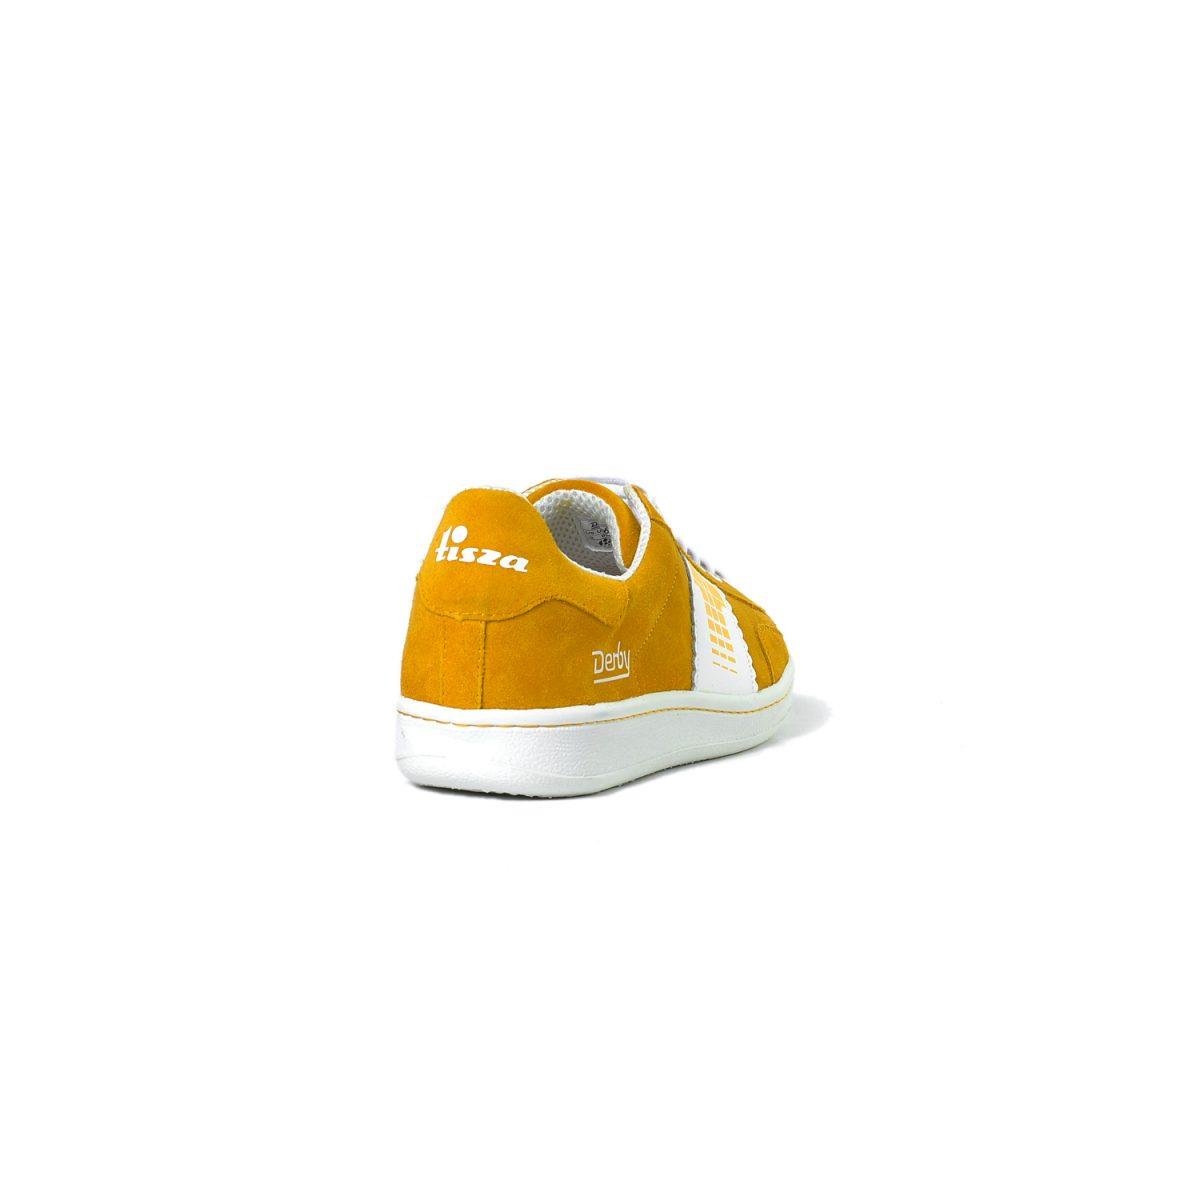 Tisza cipő - Derby - Sárga